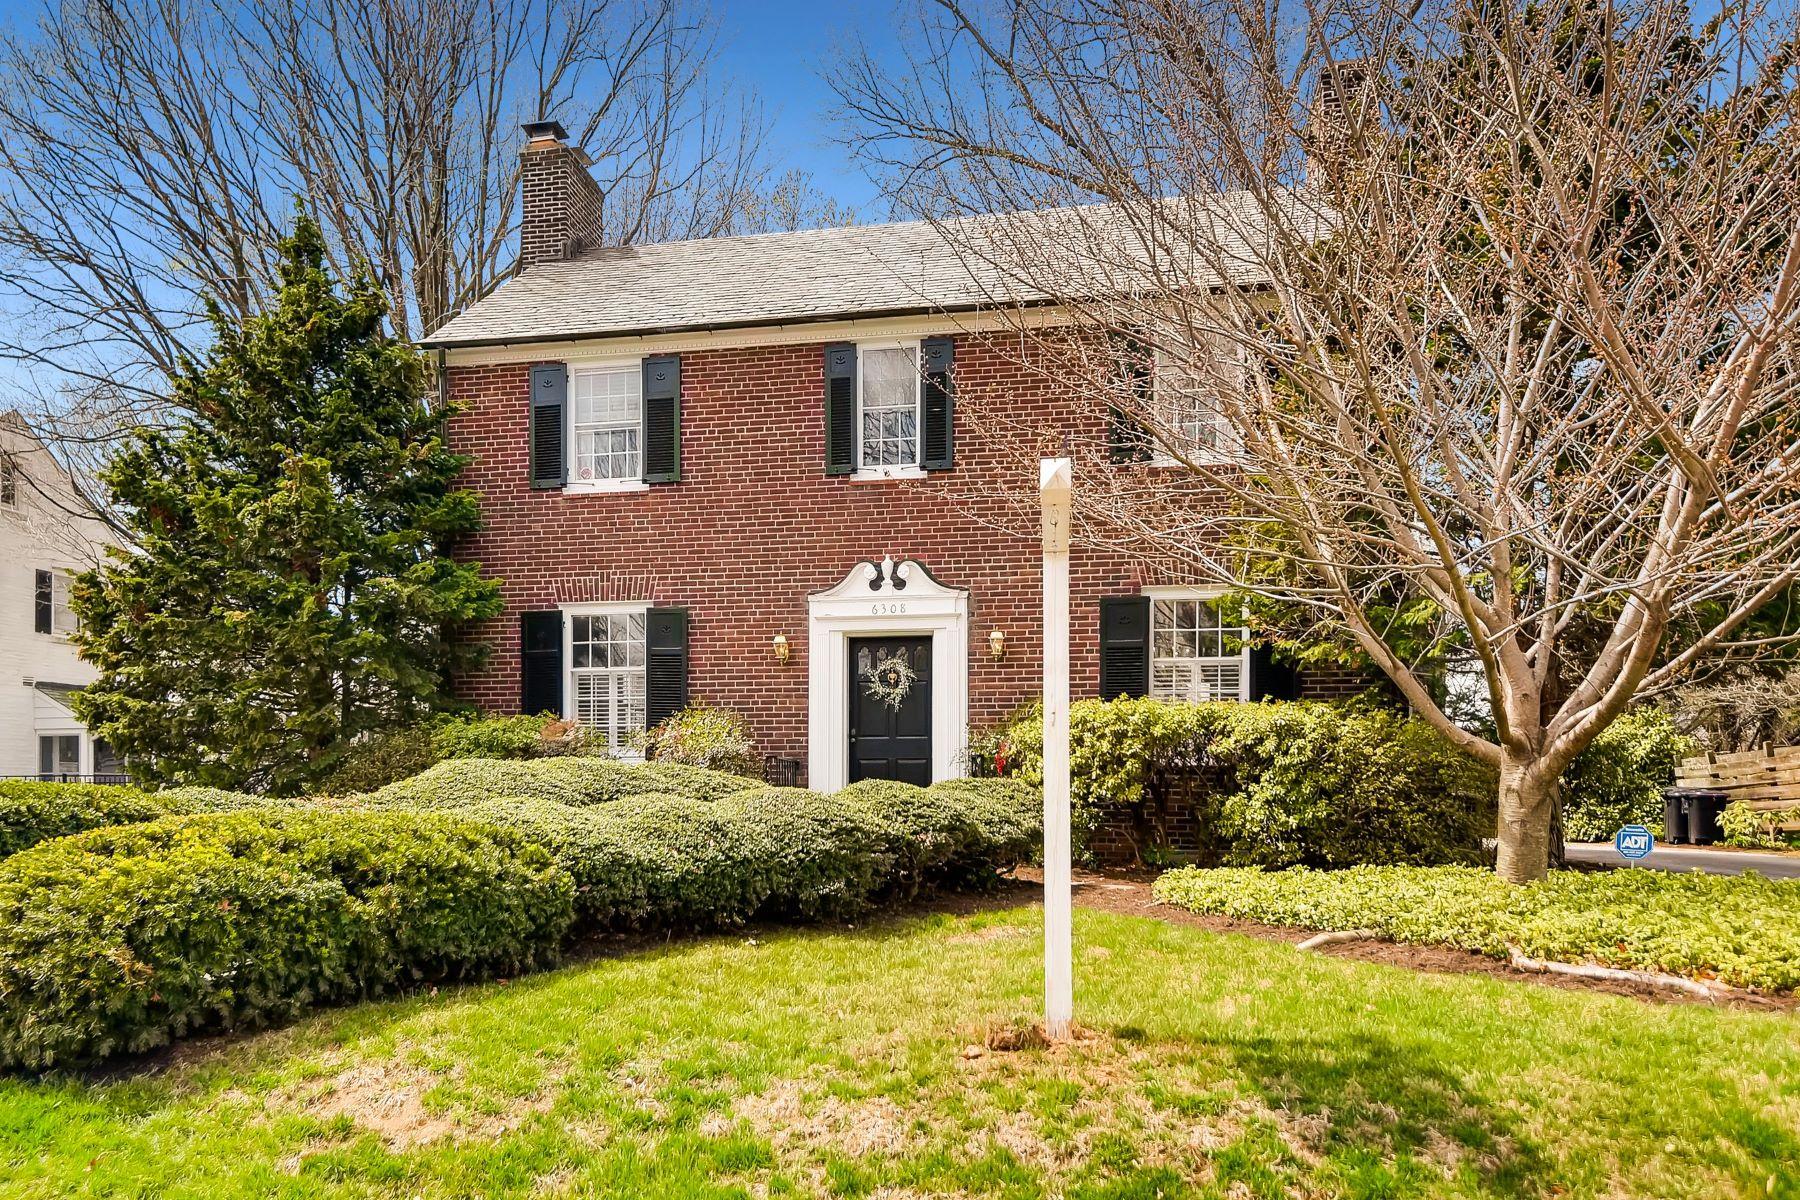 Property for Sale at Pinehurst 6308 Bellona Avenue Baltimore, Maryland 21212 United States